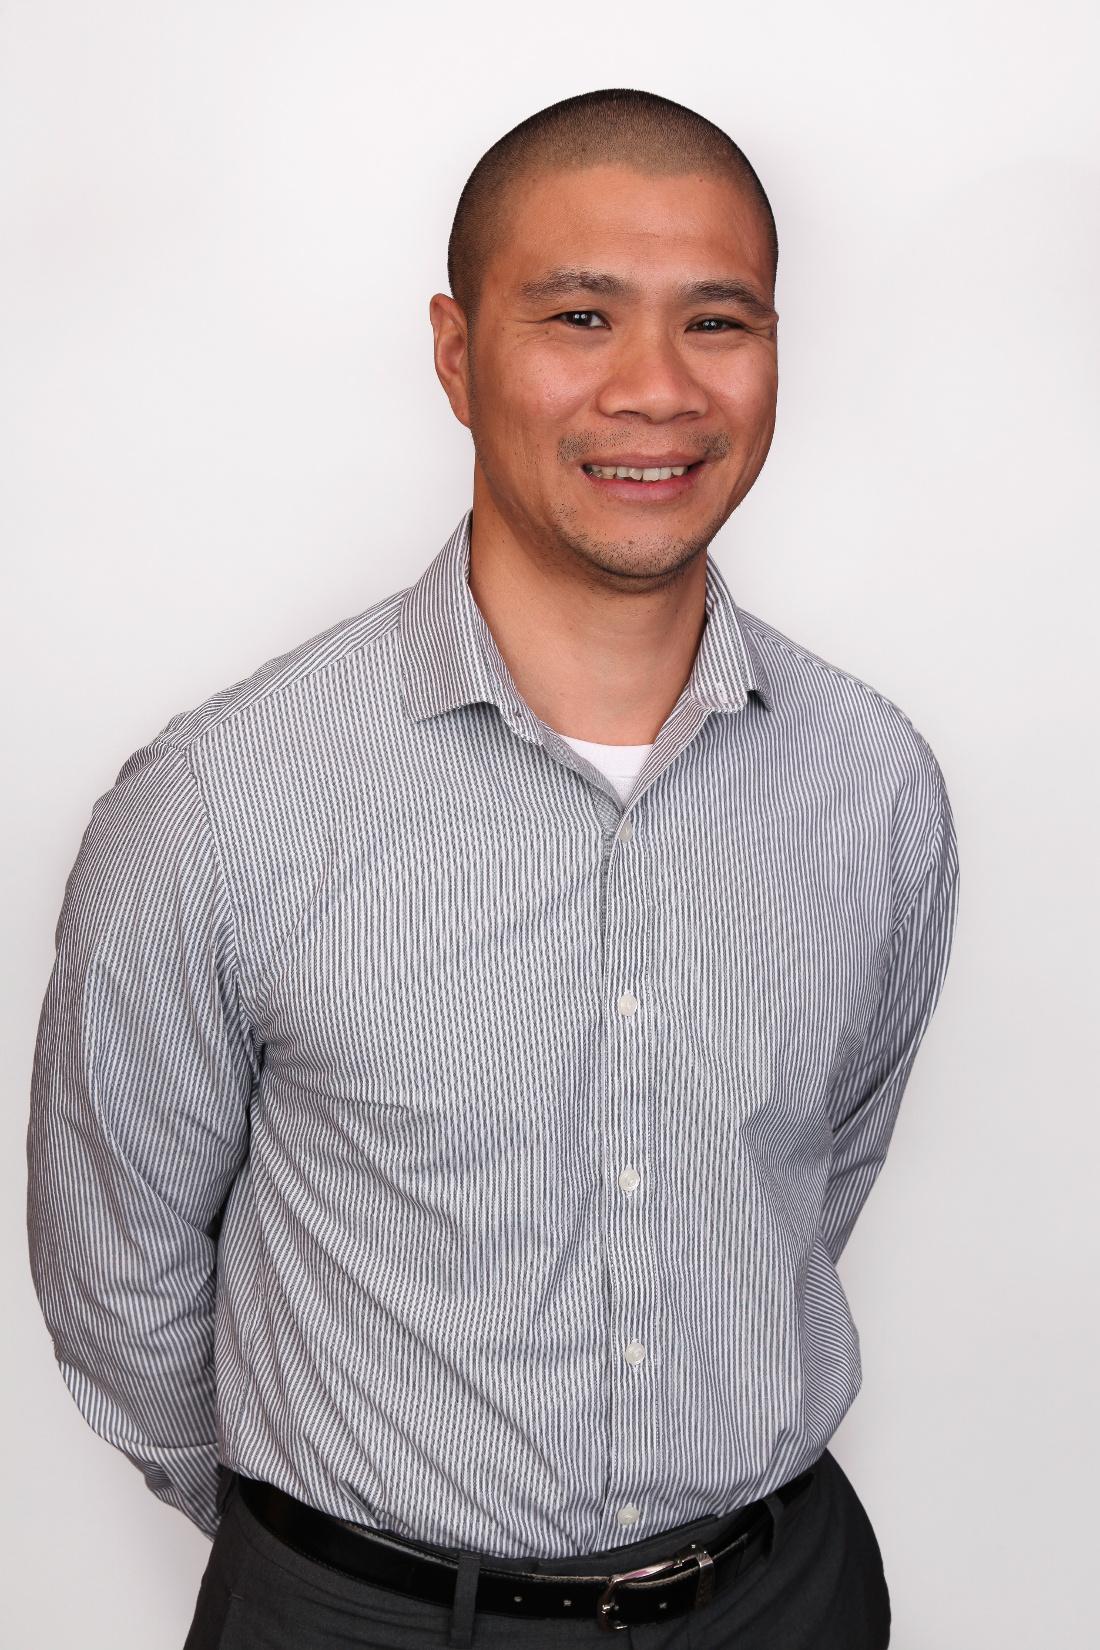 Trent Nguyen